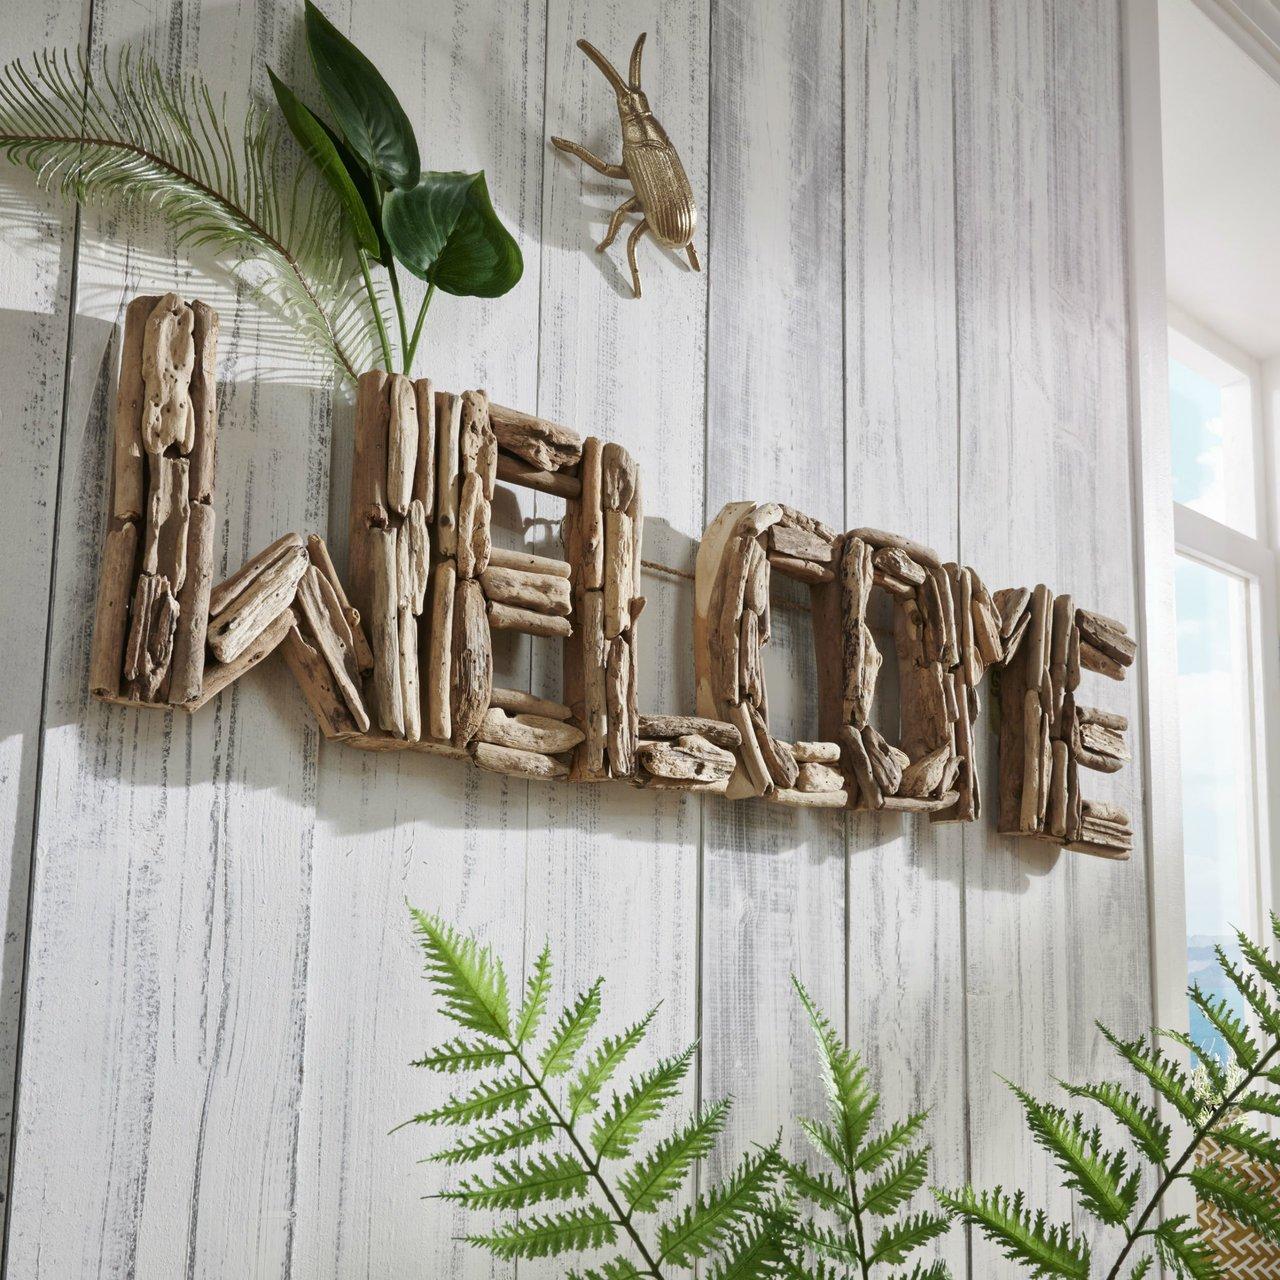 Faktorei Unikat Wand-Dekoration Welcome Teakholz